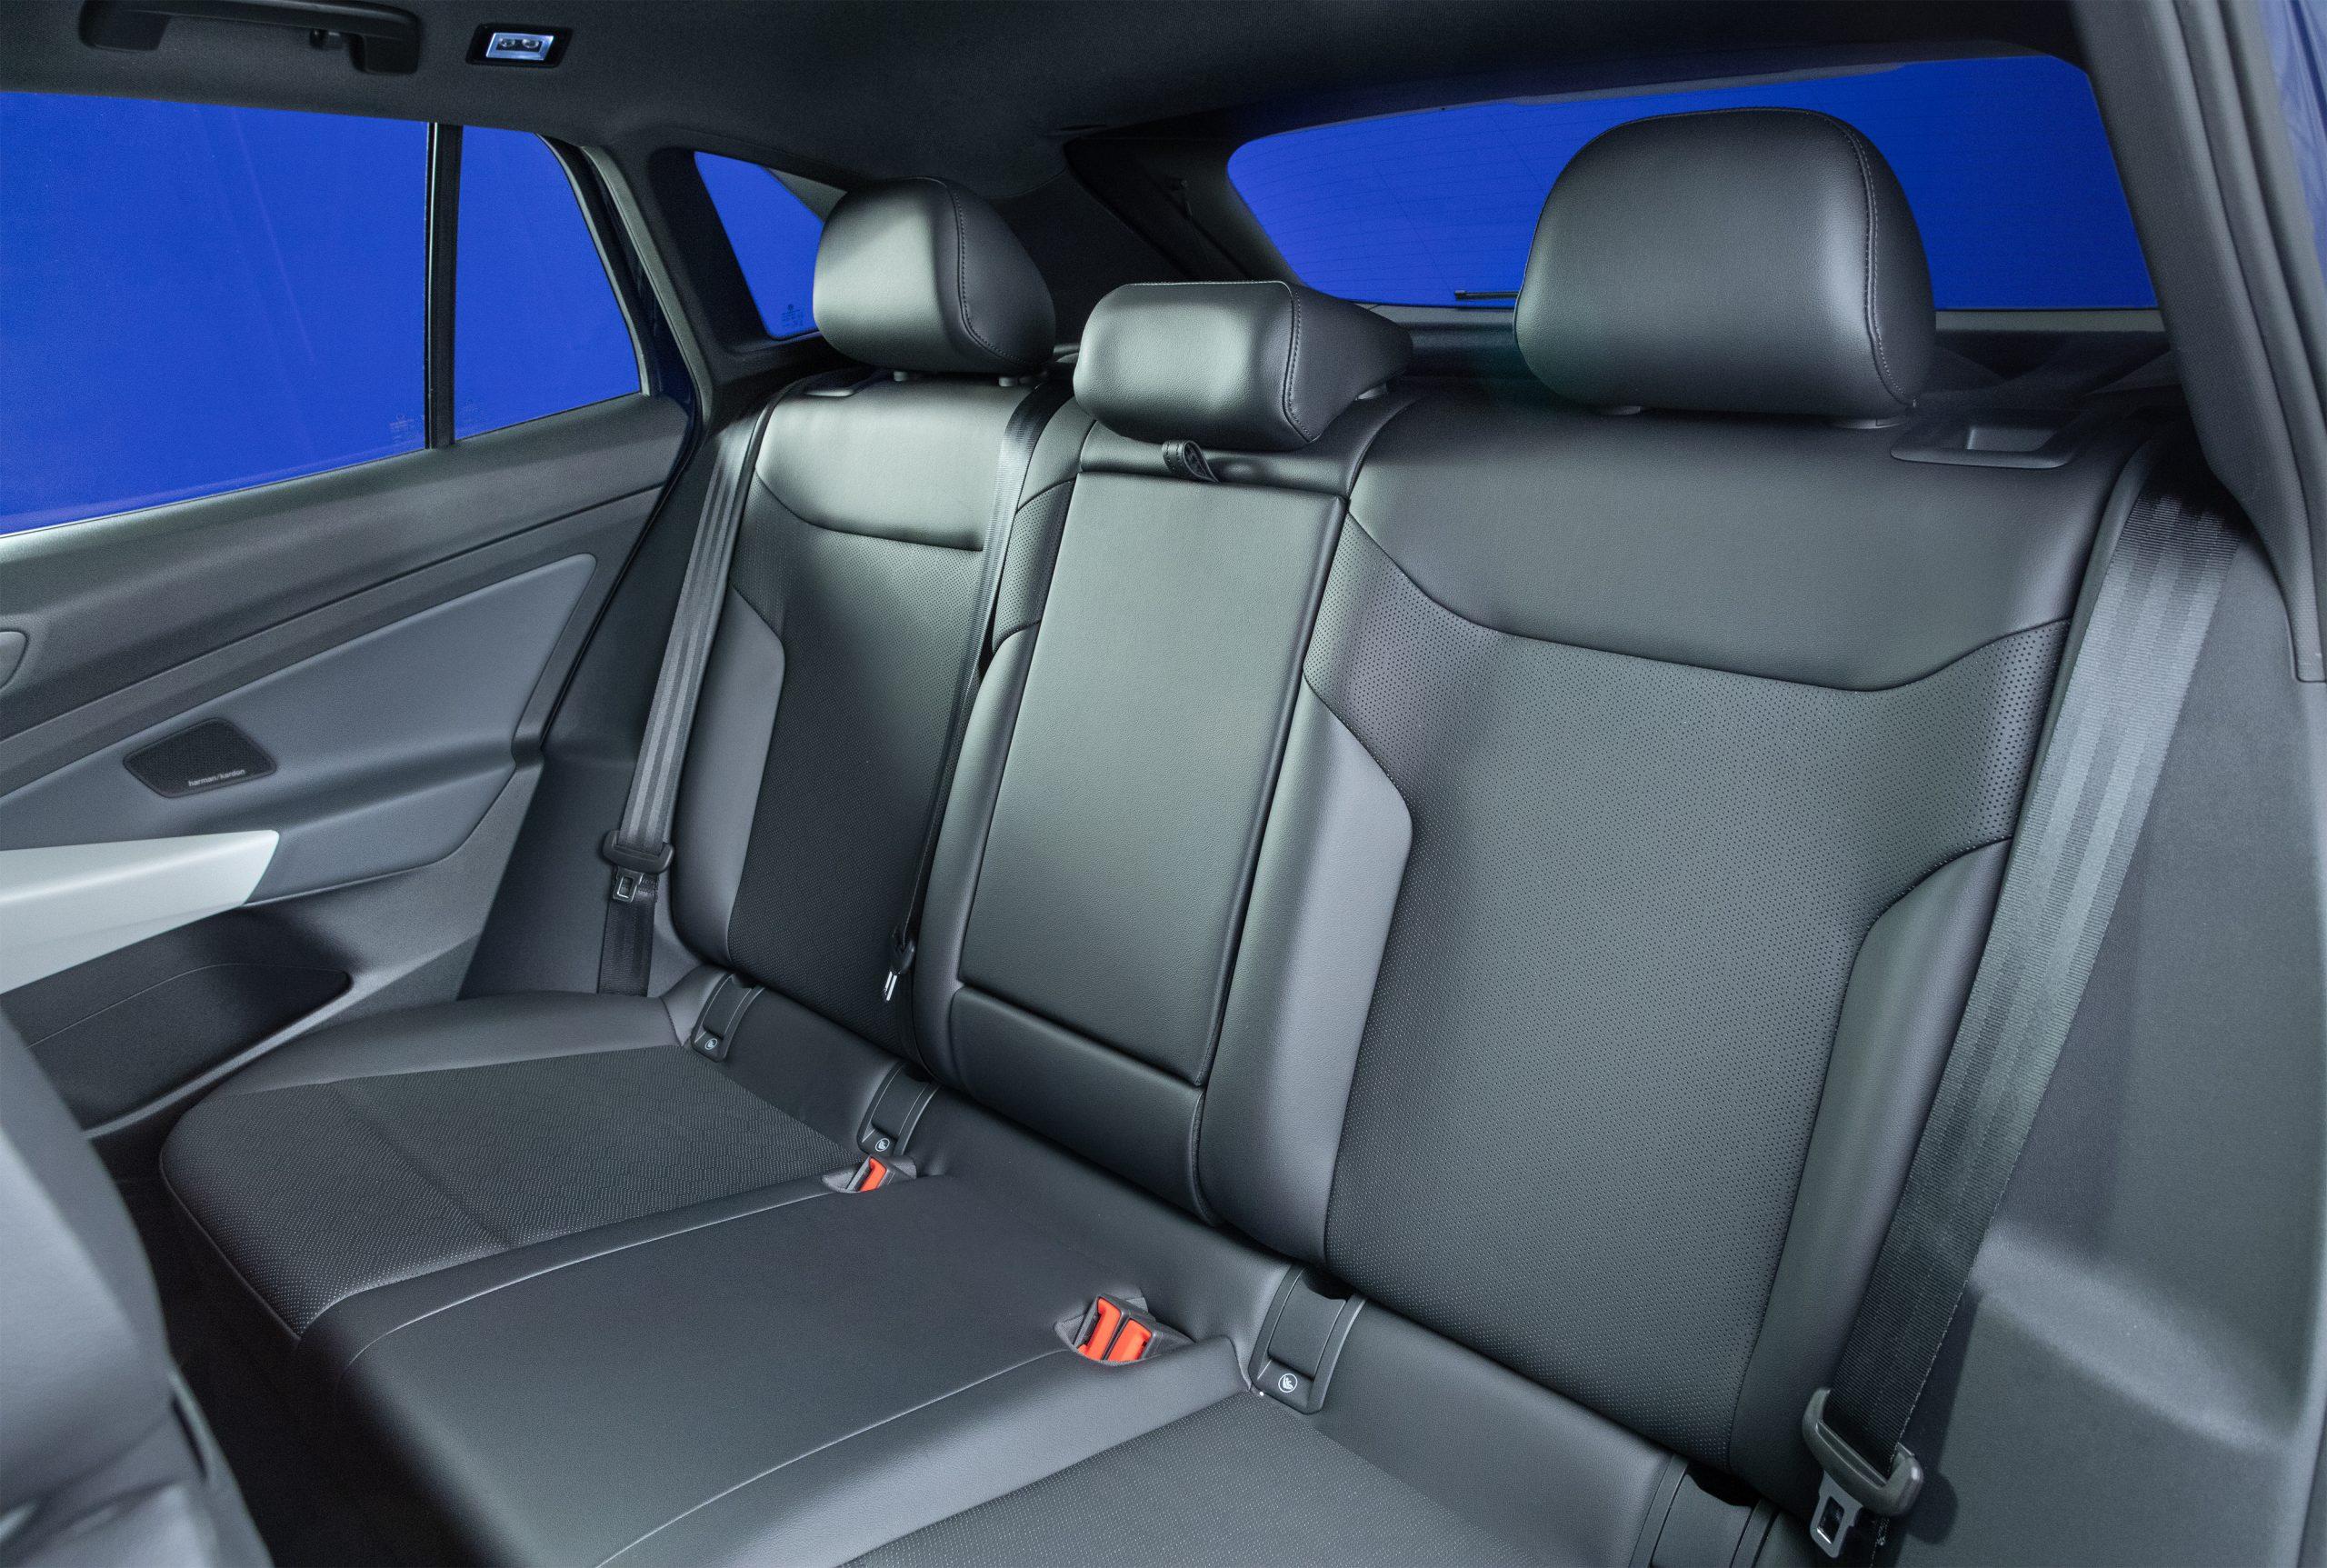 2021 VW ID.4 electric SUV back seats